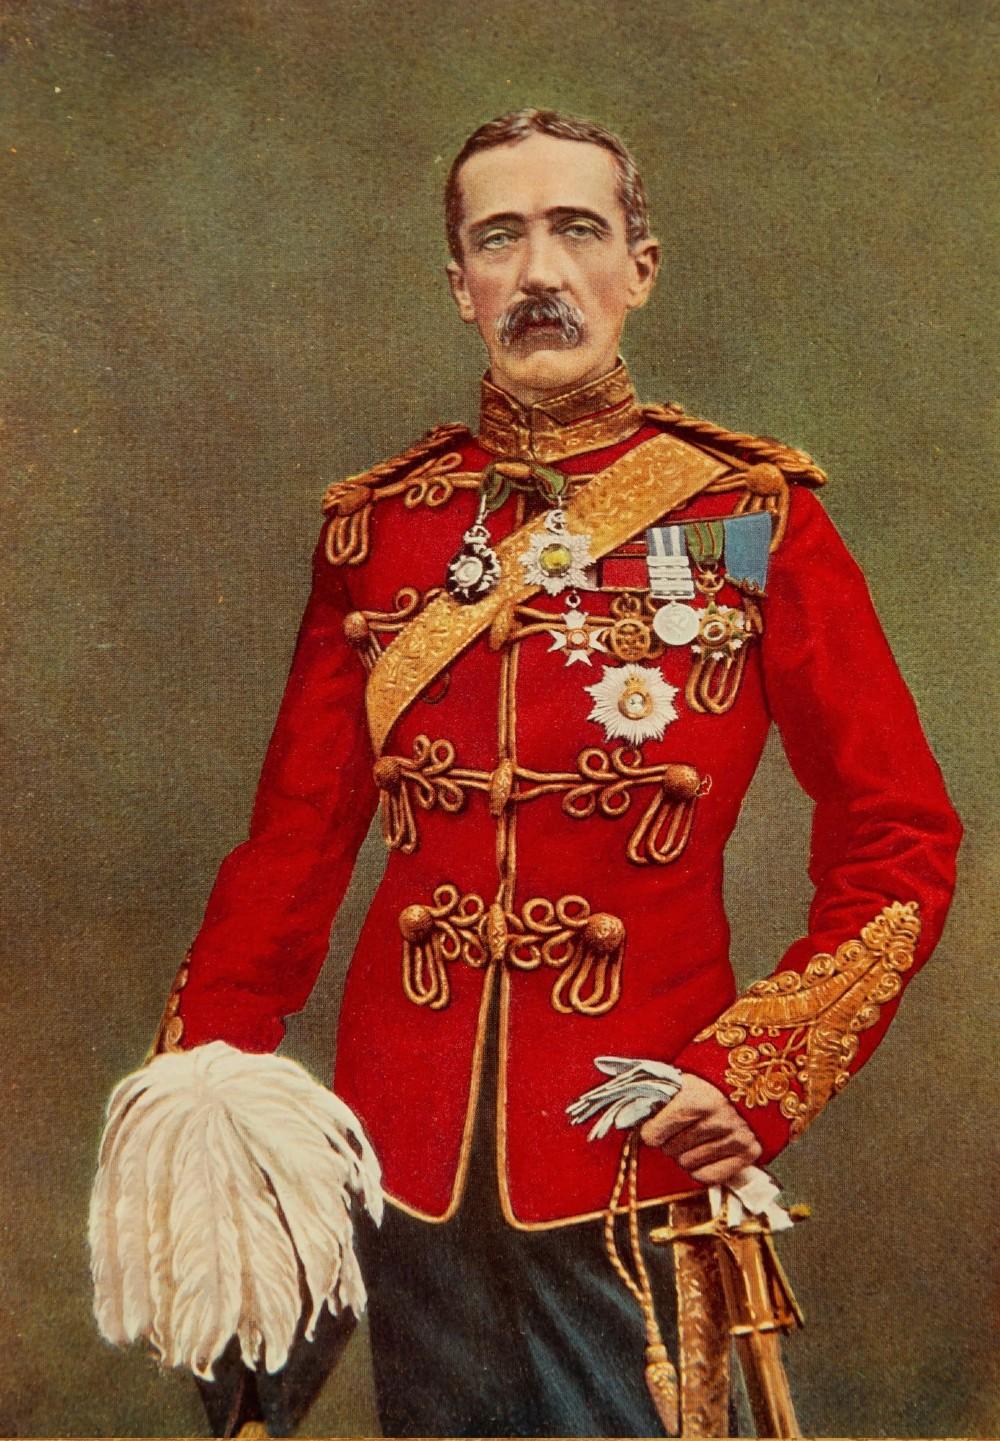 major general sir john charles ardagh lithograph 1900